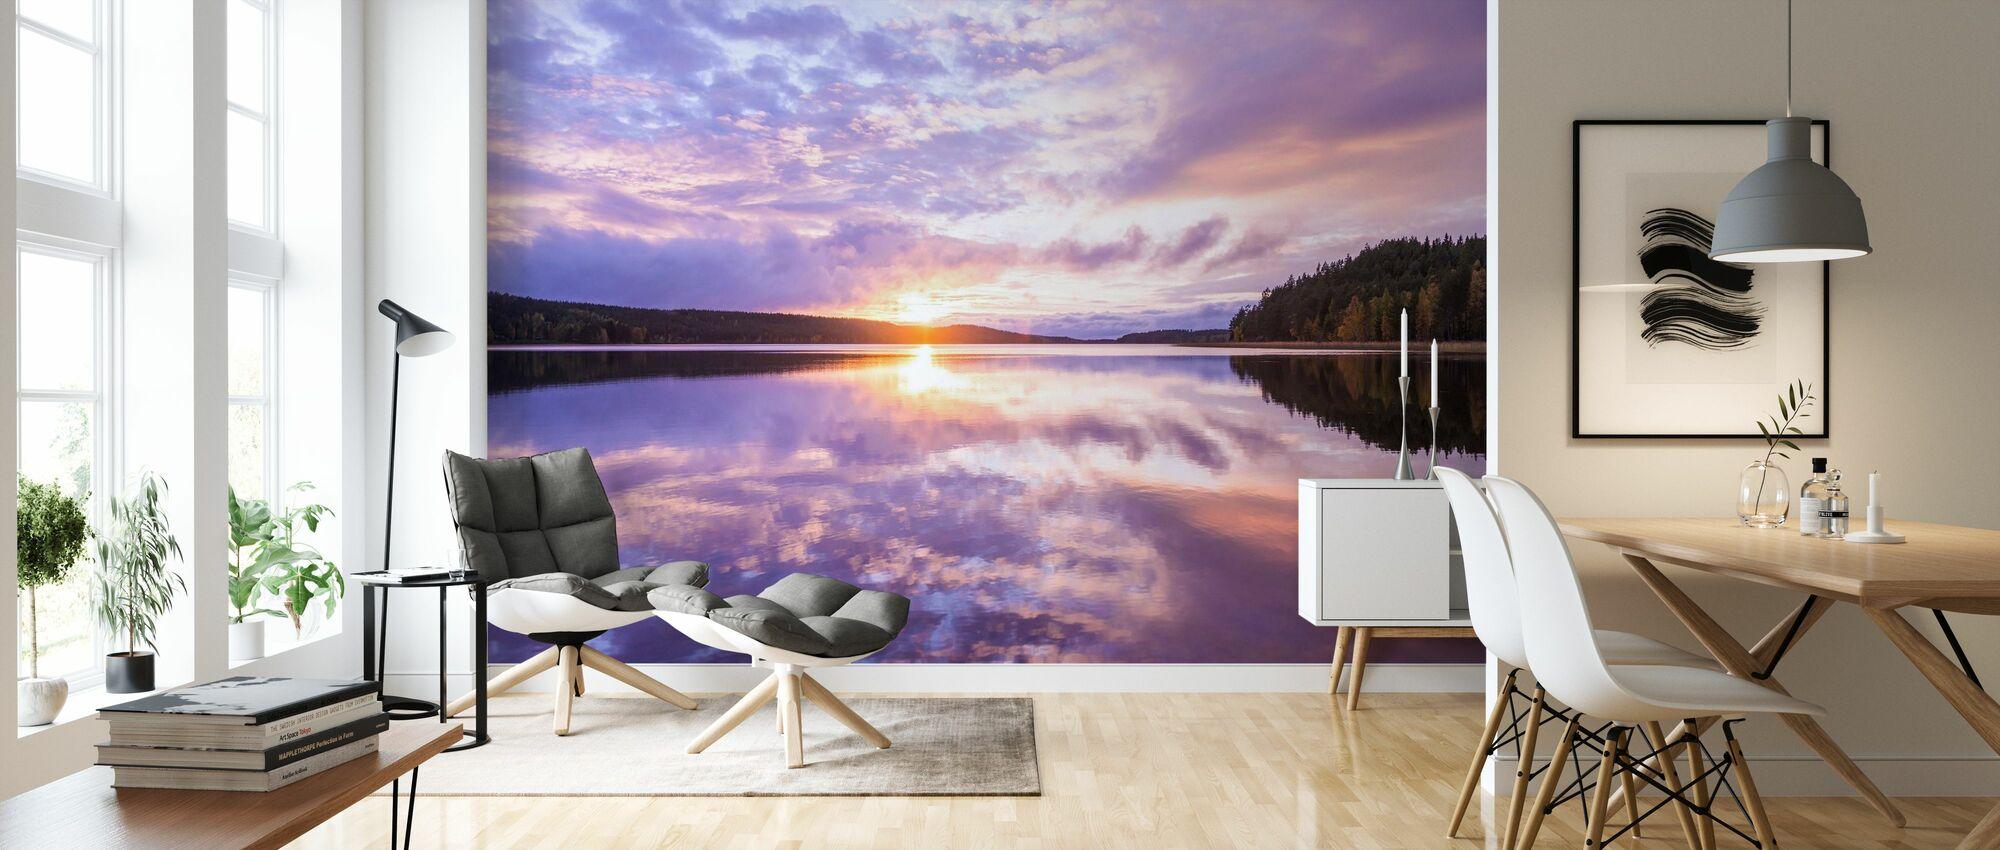 Reflections - Wallpaper - Living Room